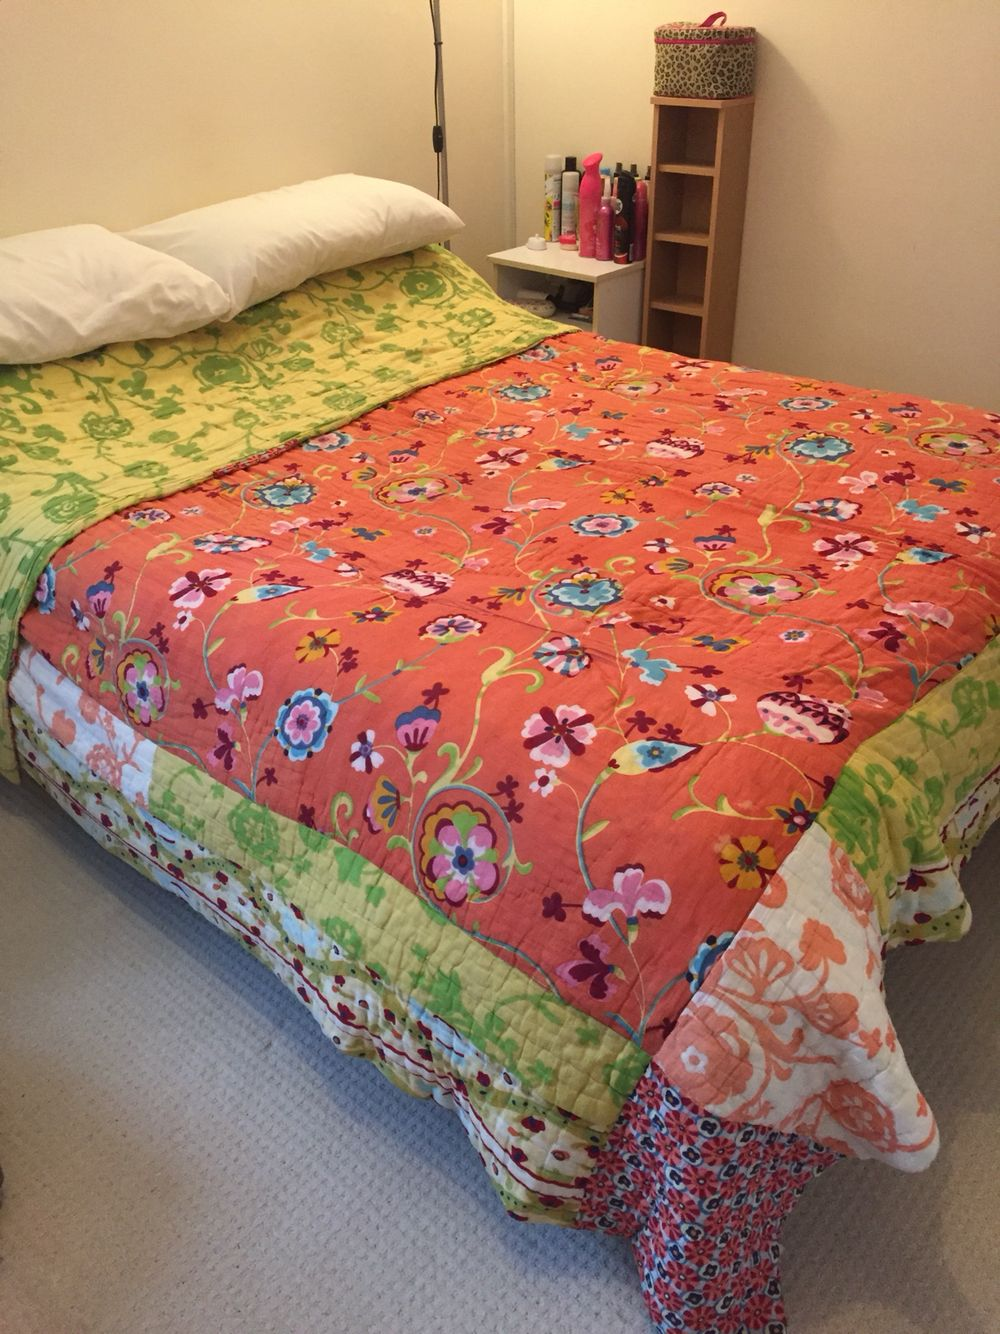 042c36c7f38 I finally got my mitts on her bedding set